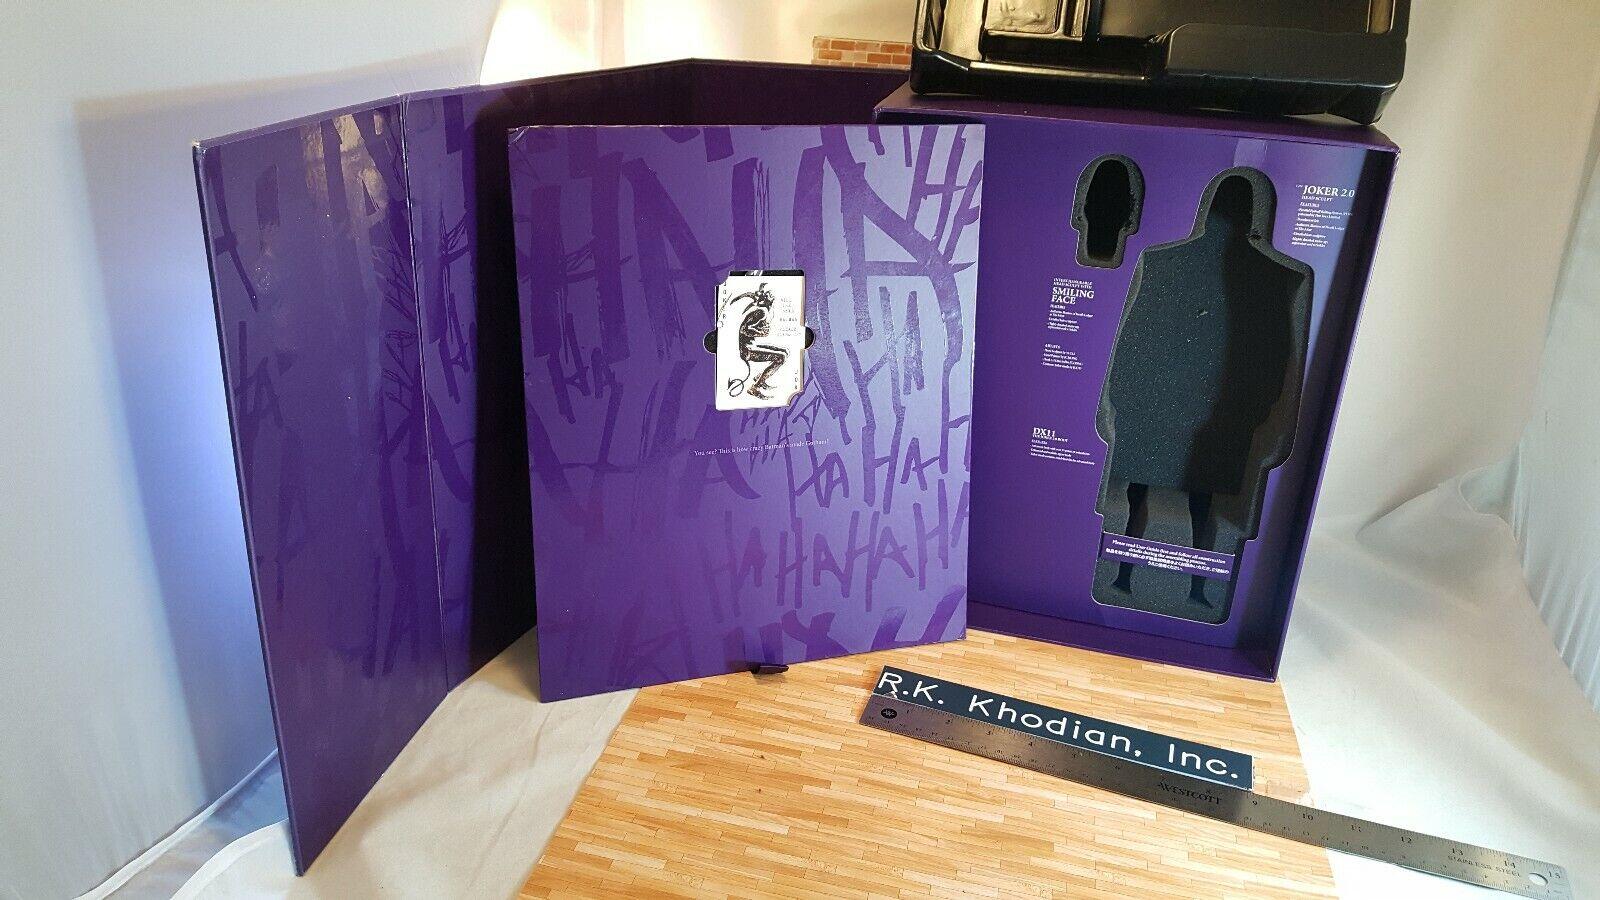 caliente giocattoli DX11 Batuomo Dark Knight 16 Joker 2. azione cifra's empty Art scatola only